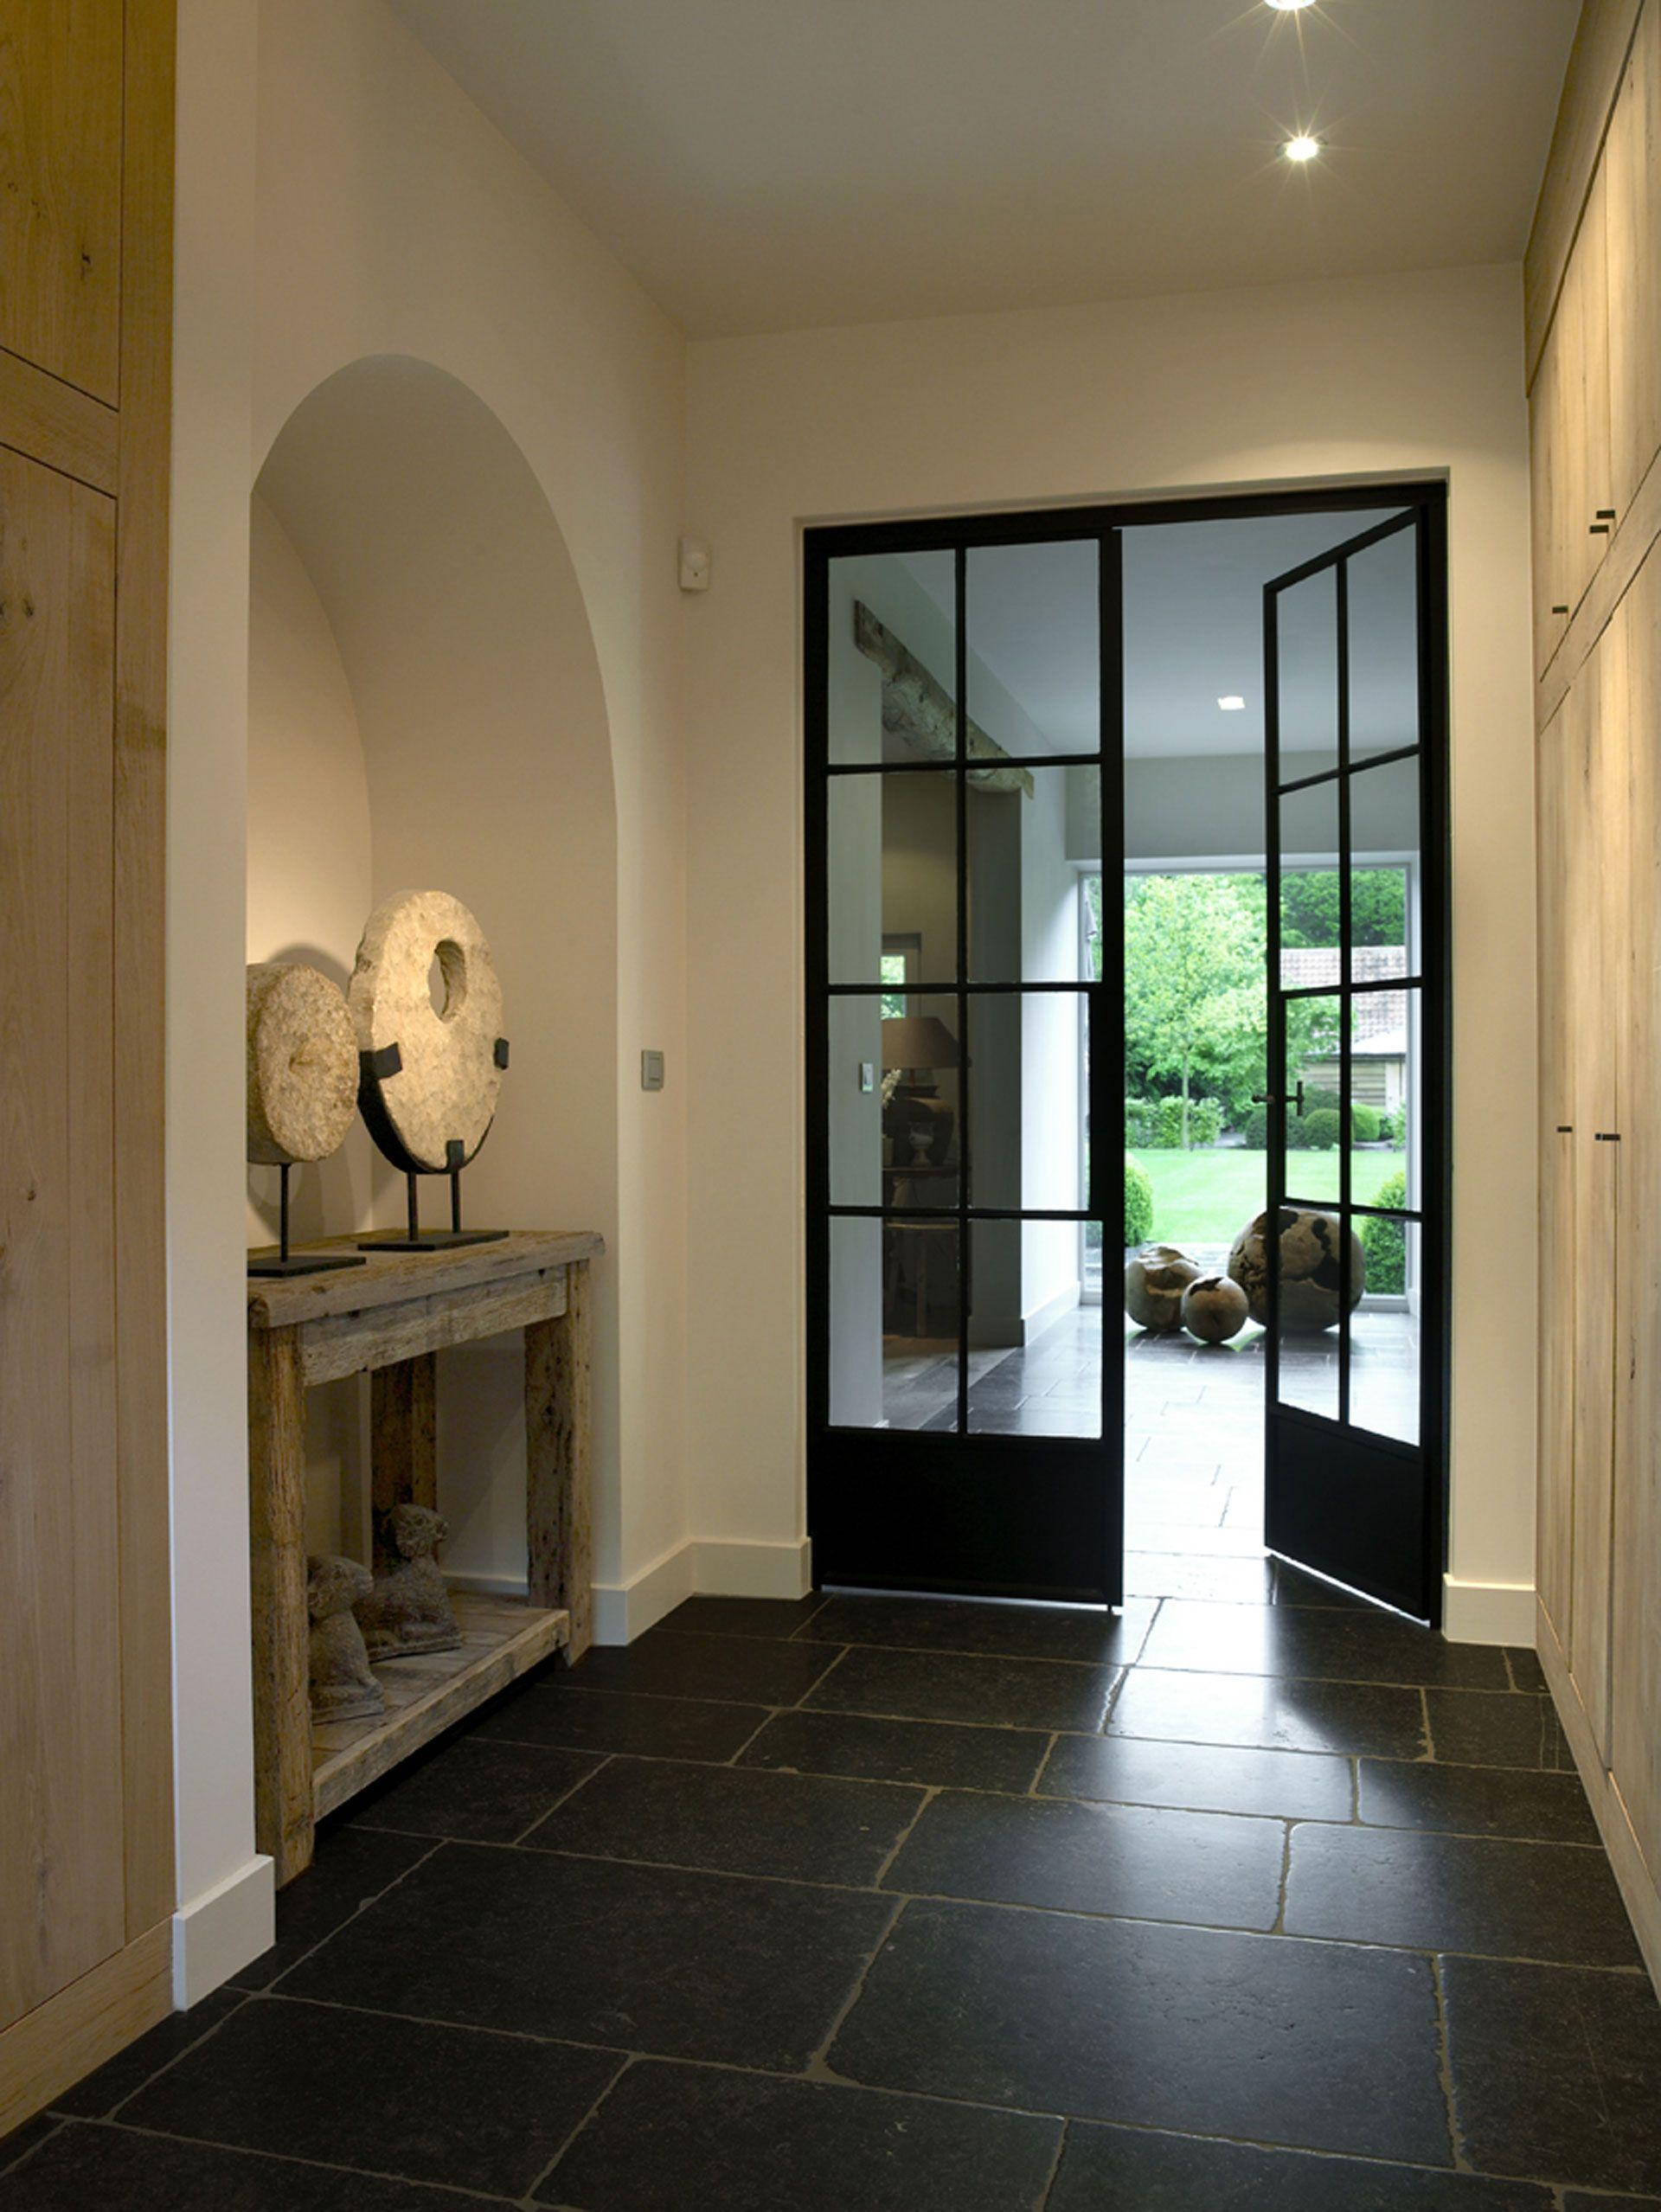 slate floors and rustic artifacts & slate floors and rustic artifacts | Antique with Modern ... pezcame.com